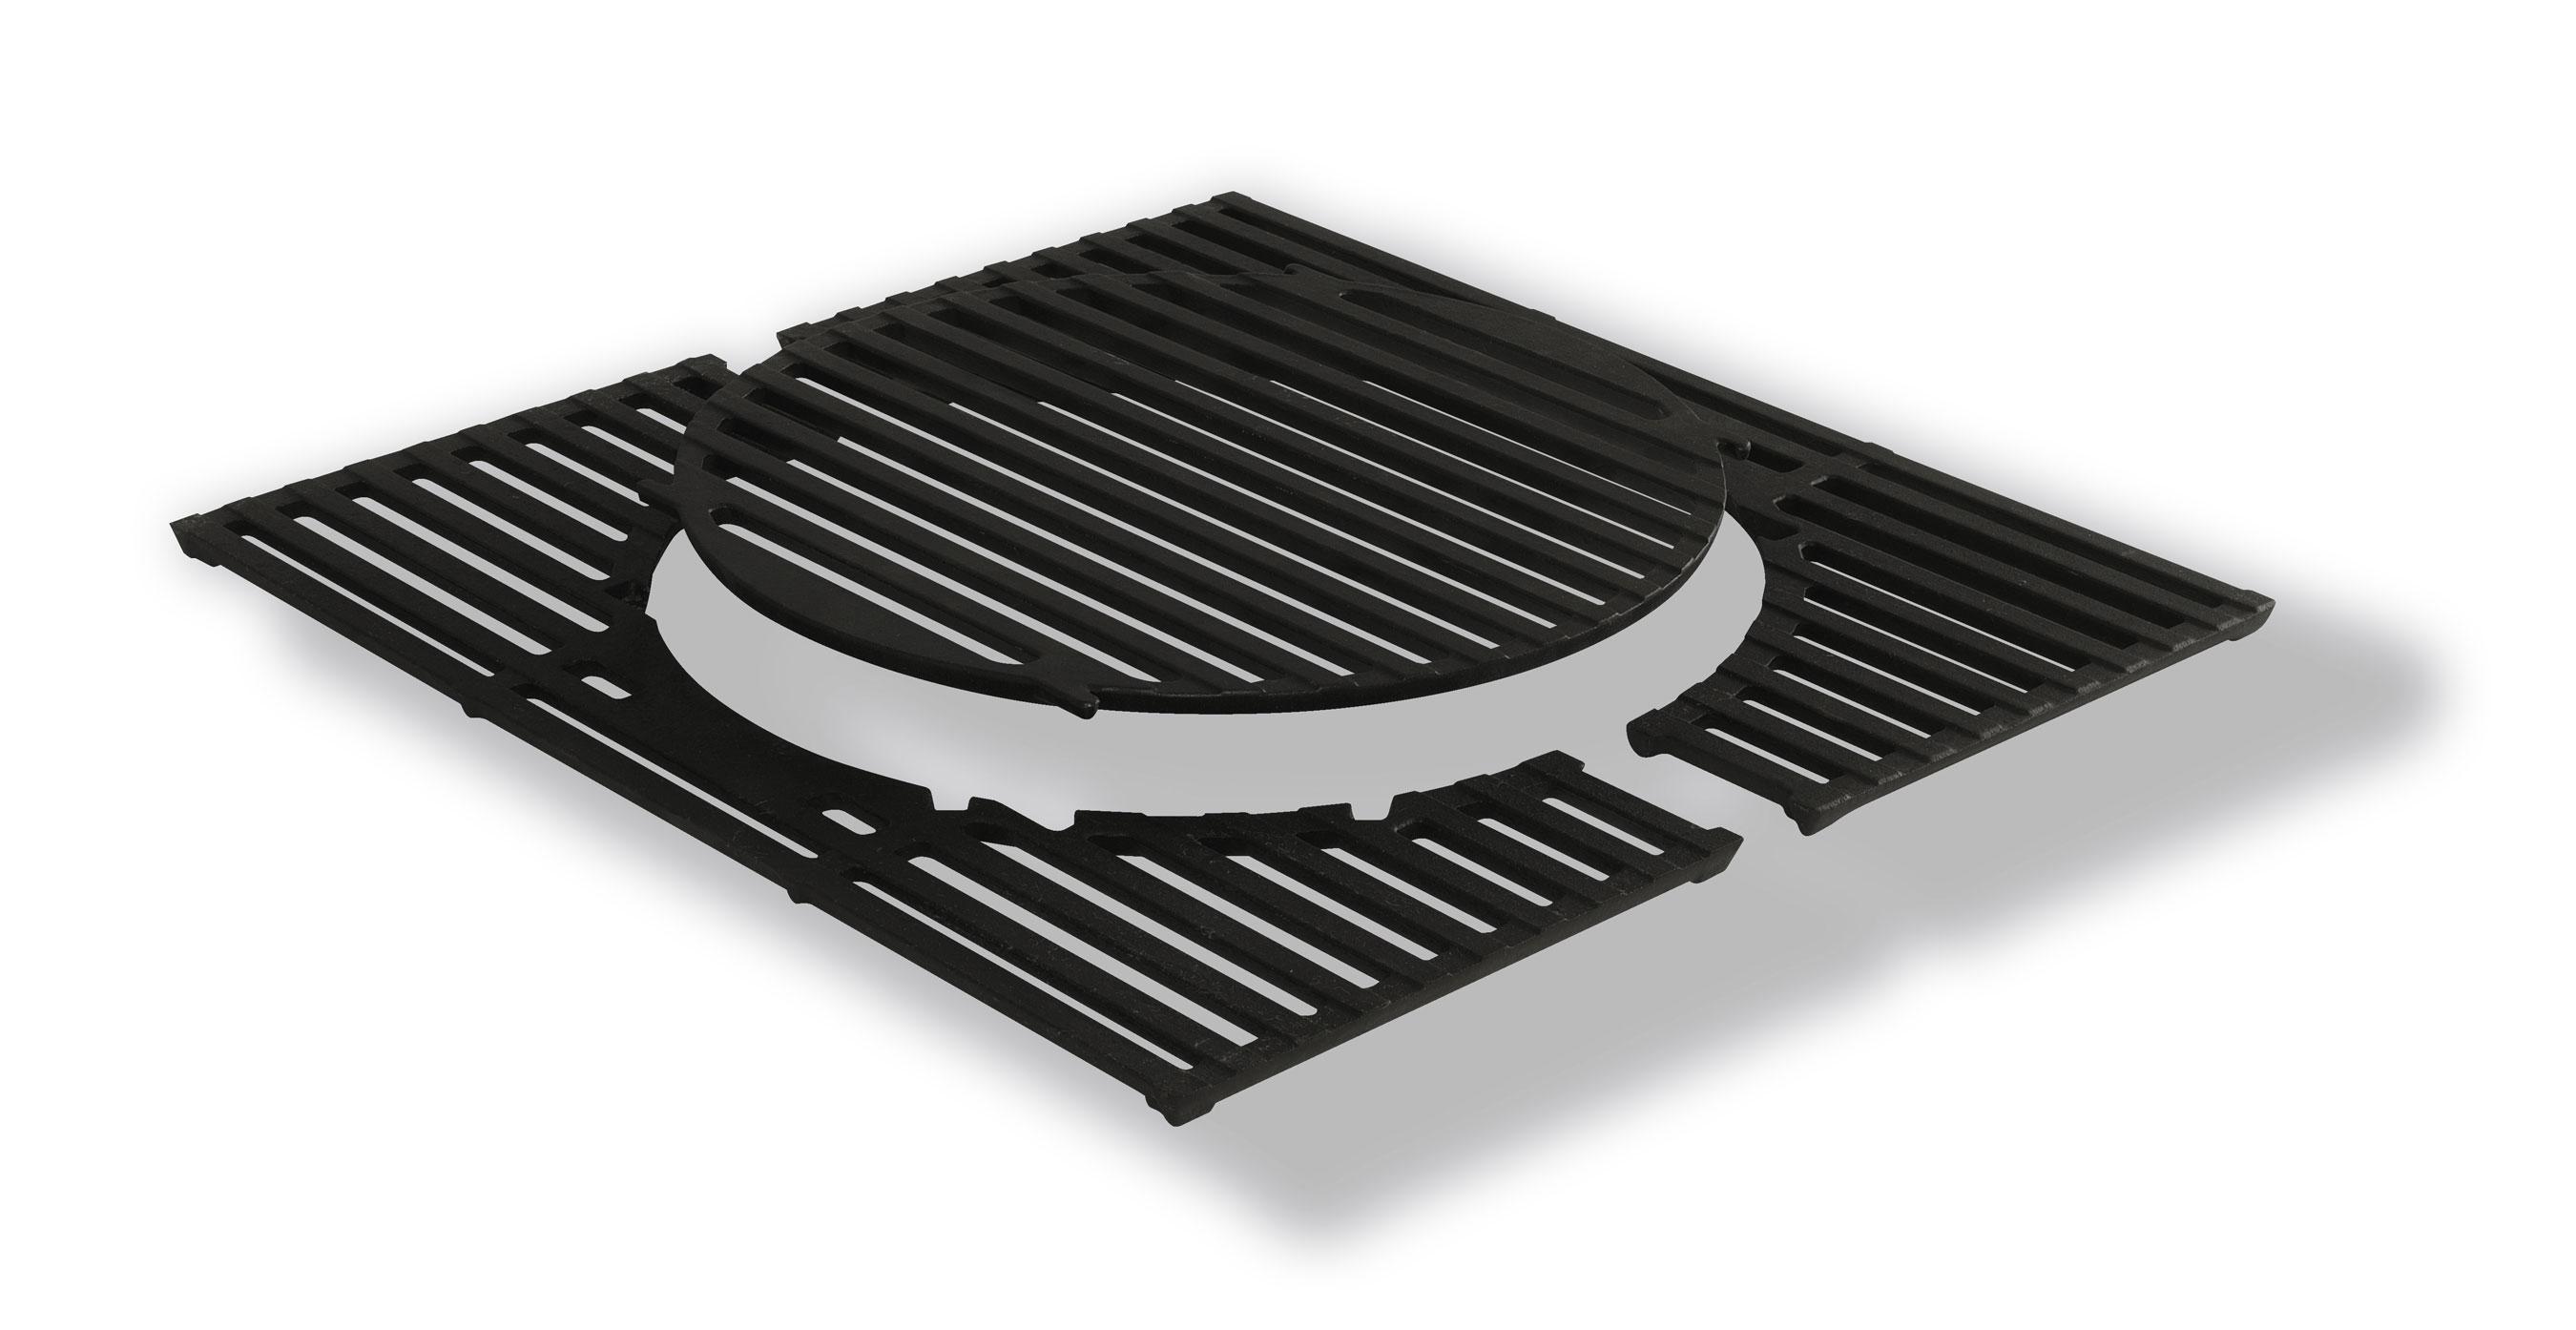 Enders Gasgrill Kansas Black 3k Turbo Test : Enders grill aldi. aldi gasgrill 2016 test enders monroe 3k turbo